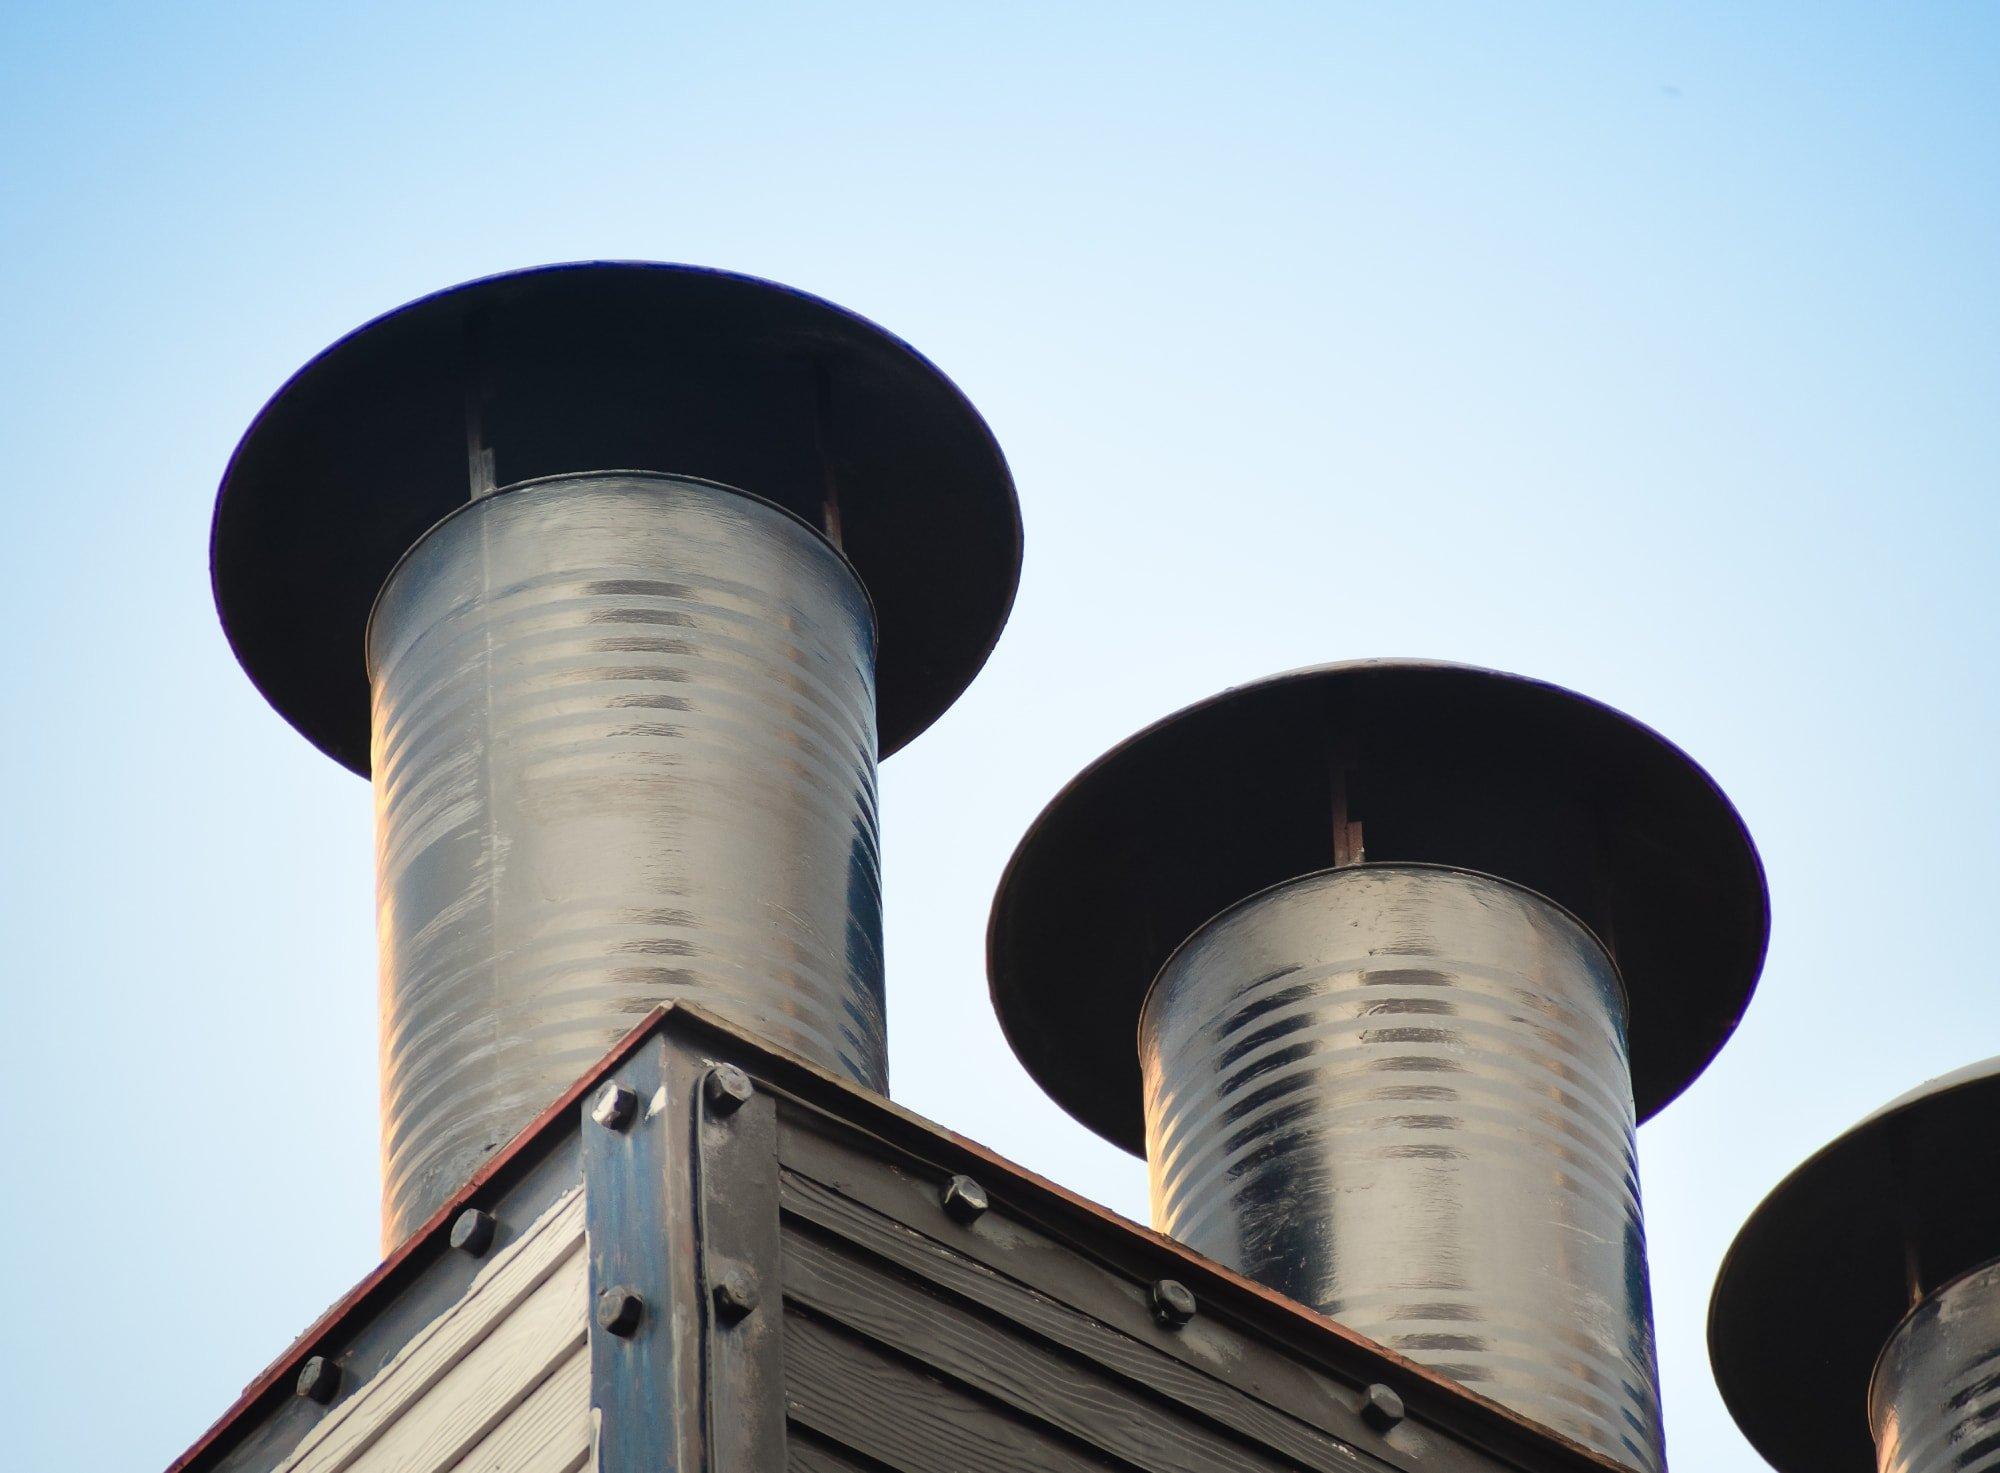 Co je to komínová stříška?